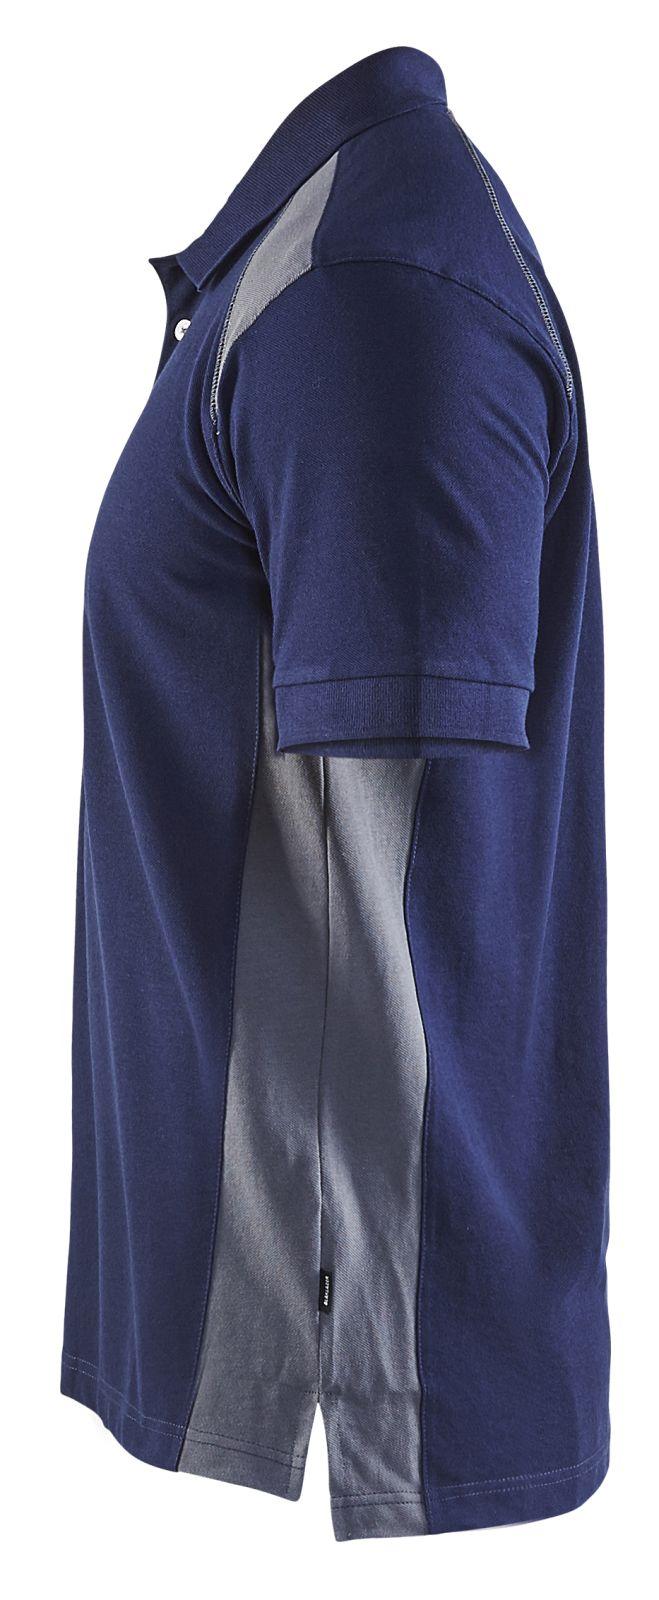 Blaklader Polo shirts 33241050 marineblauw-grijs(8994)